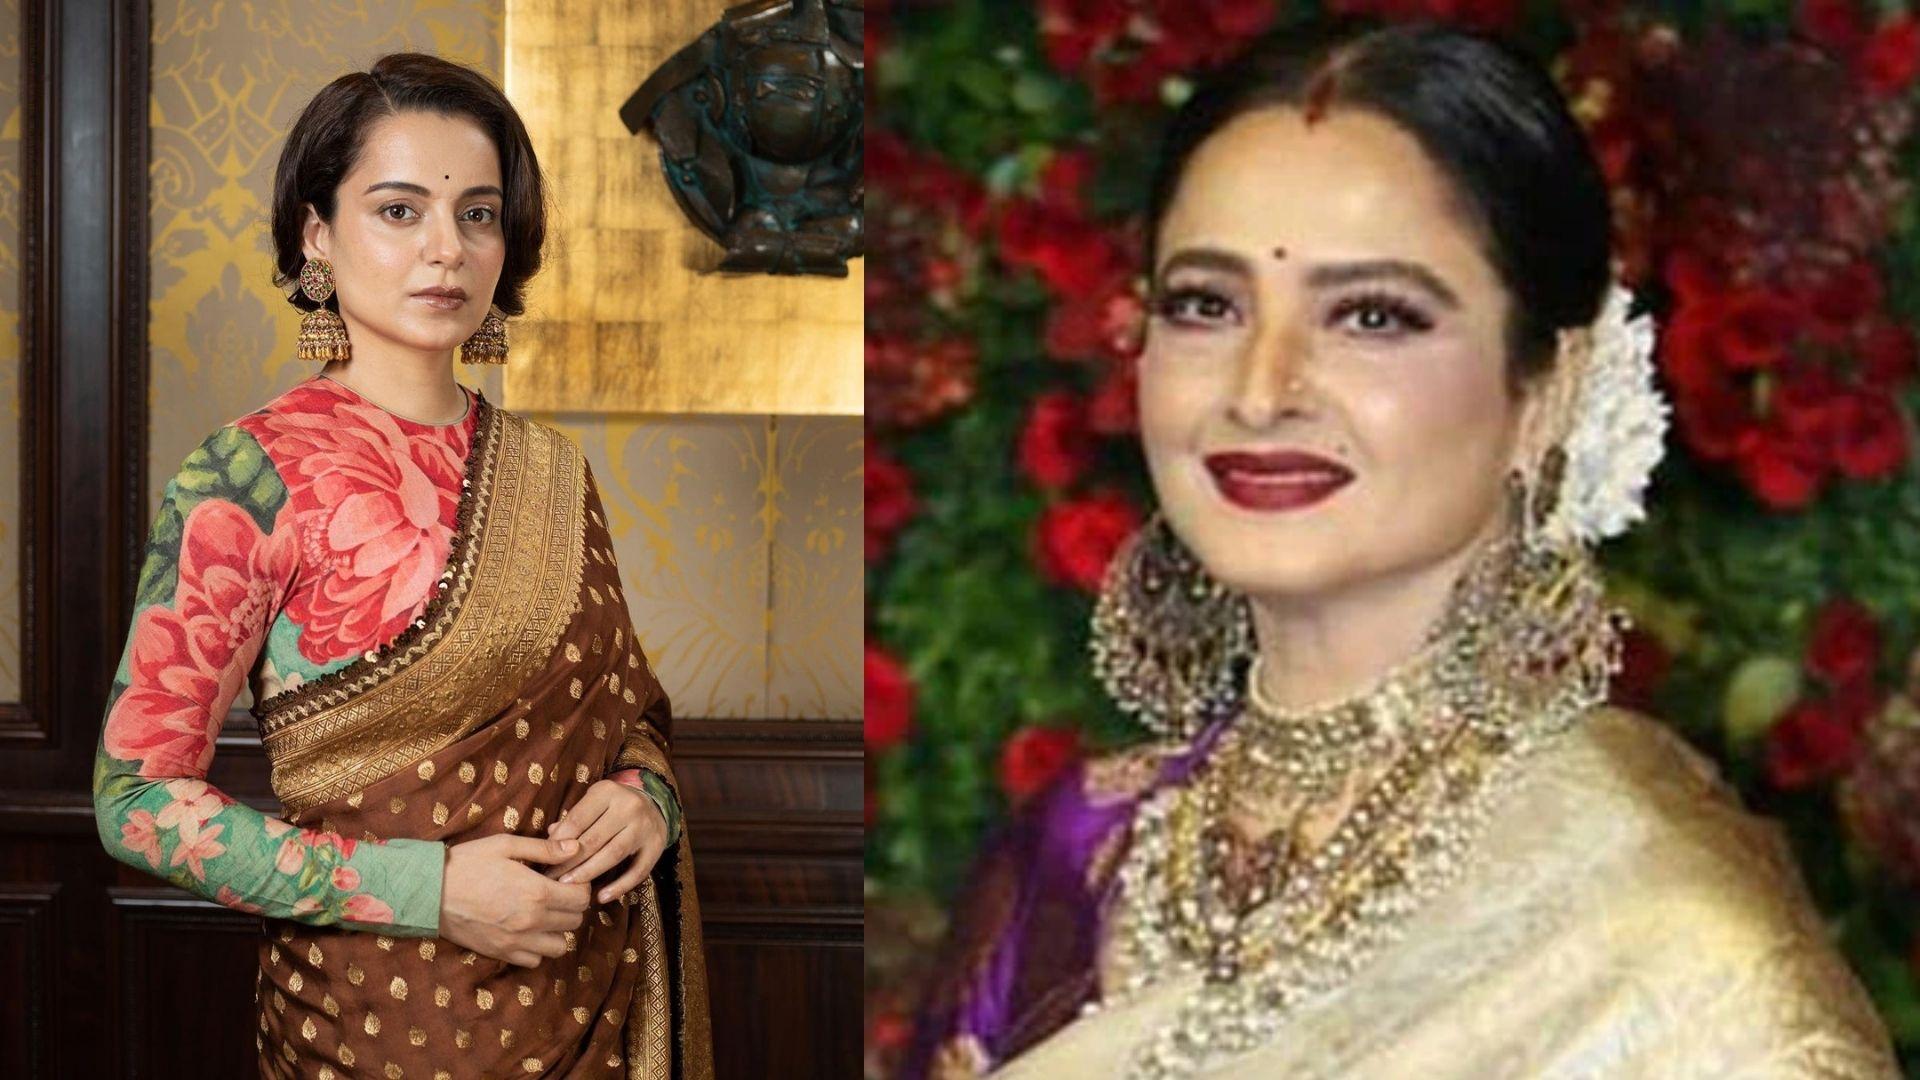 Kangana Ranaut Wishes Her 'Godmother' Rekha On Her Birthday; Shares Pic From Virat Kohli-Anushka Sharma's Reception